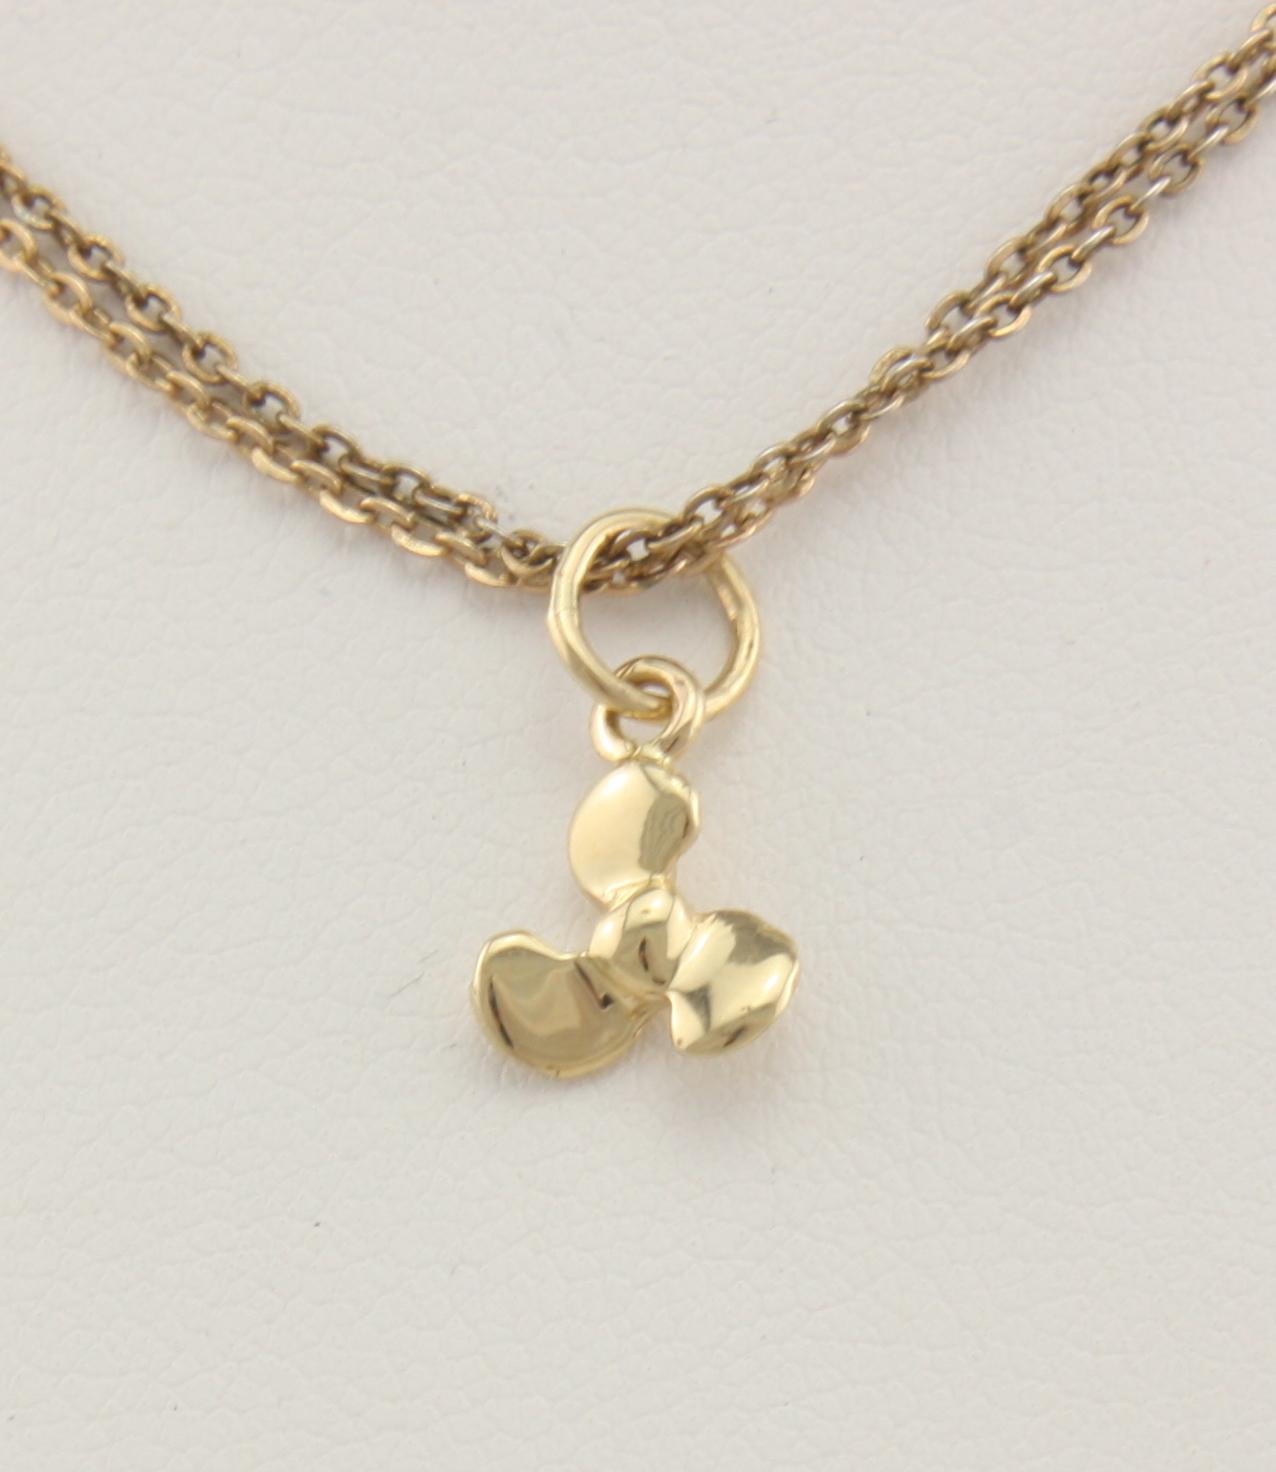 Tiny propeller 14karat neptune designs custom for Key west jewelry stores